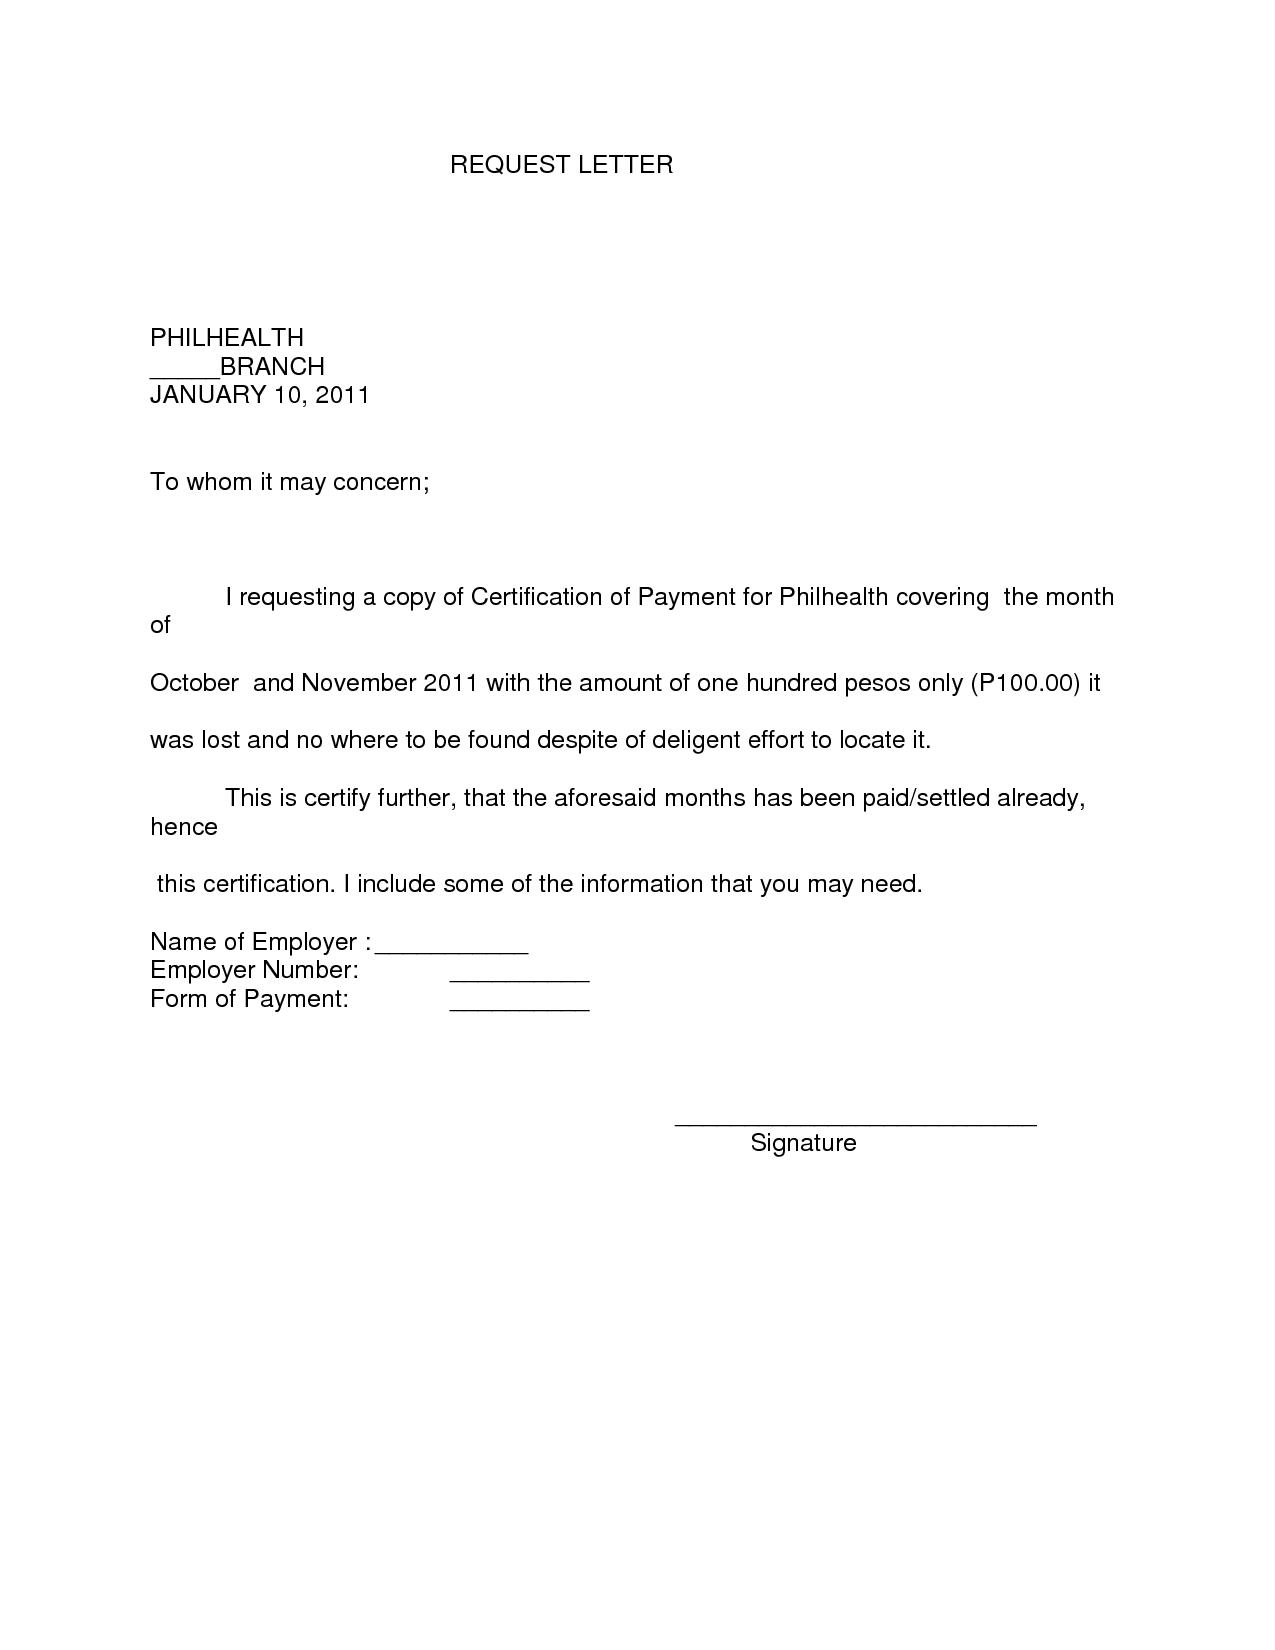 Authorization request letter form download free documents pdf word authorization letter sample and request for with specimen signature serversdb best free home design idea inspiration altavistaventures Images